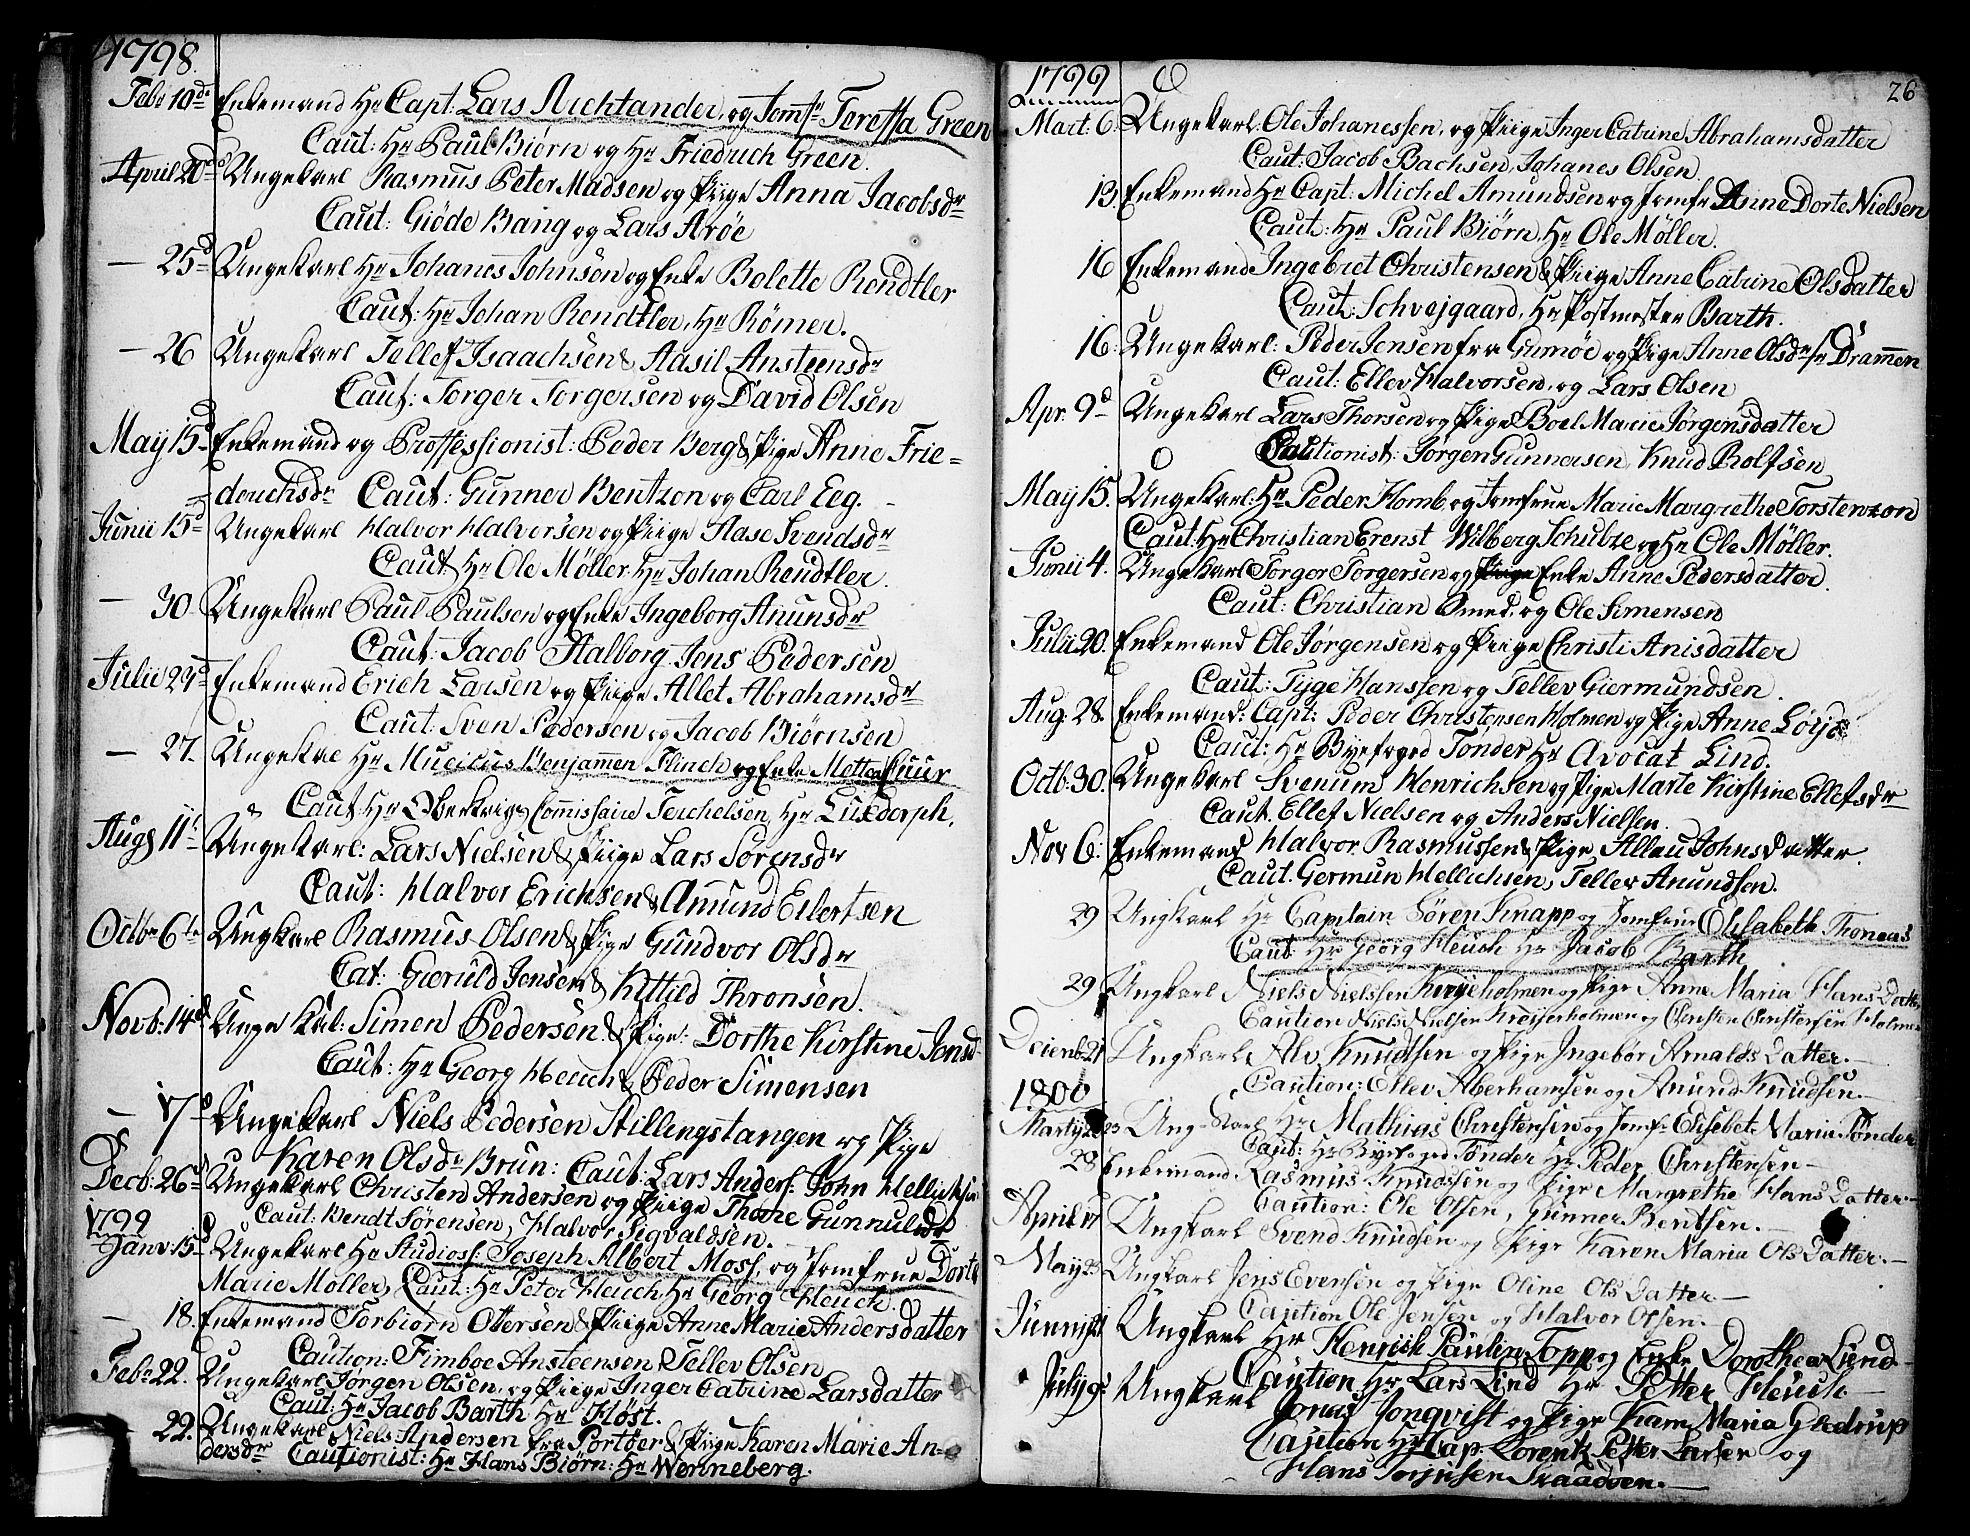 SAKO, Kragerø kirkebøker, F/Fa/L0002: Ministerialbok nr. 2, 1767-1802, s. 26